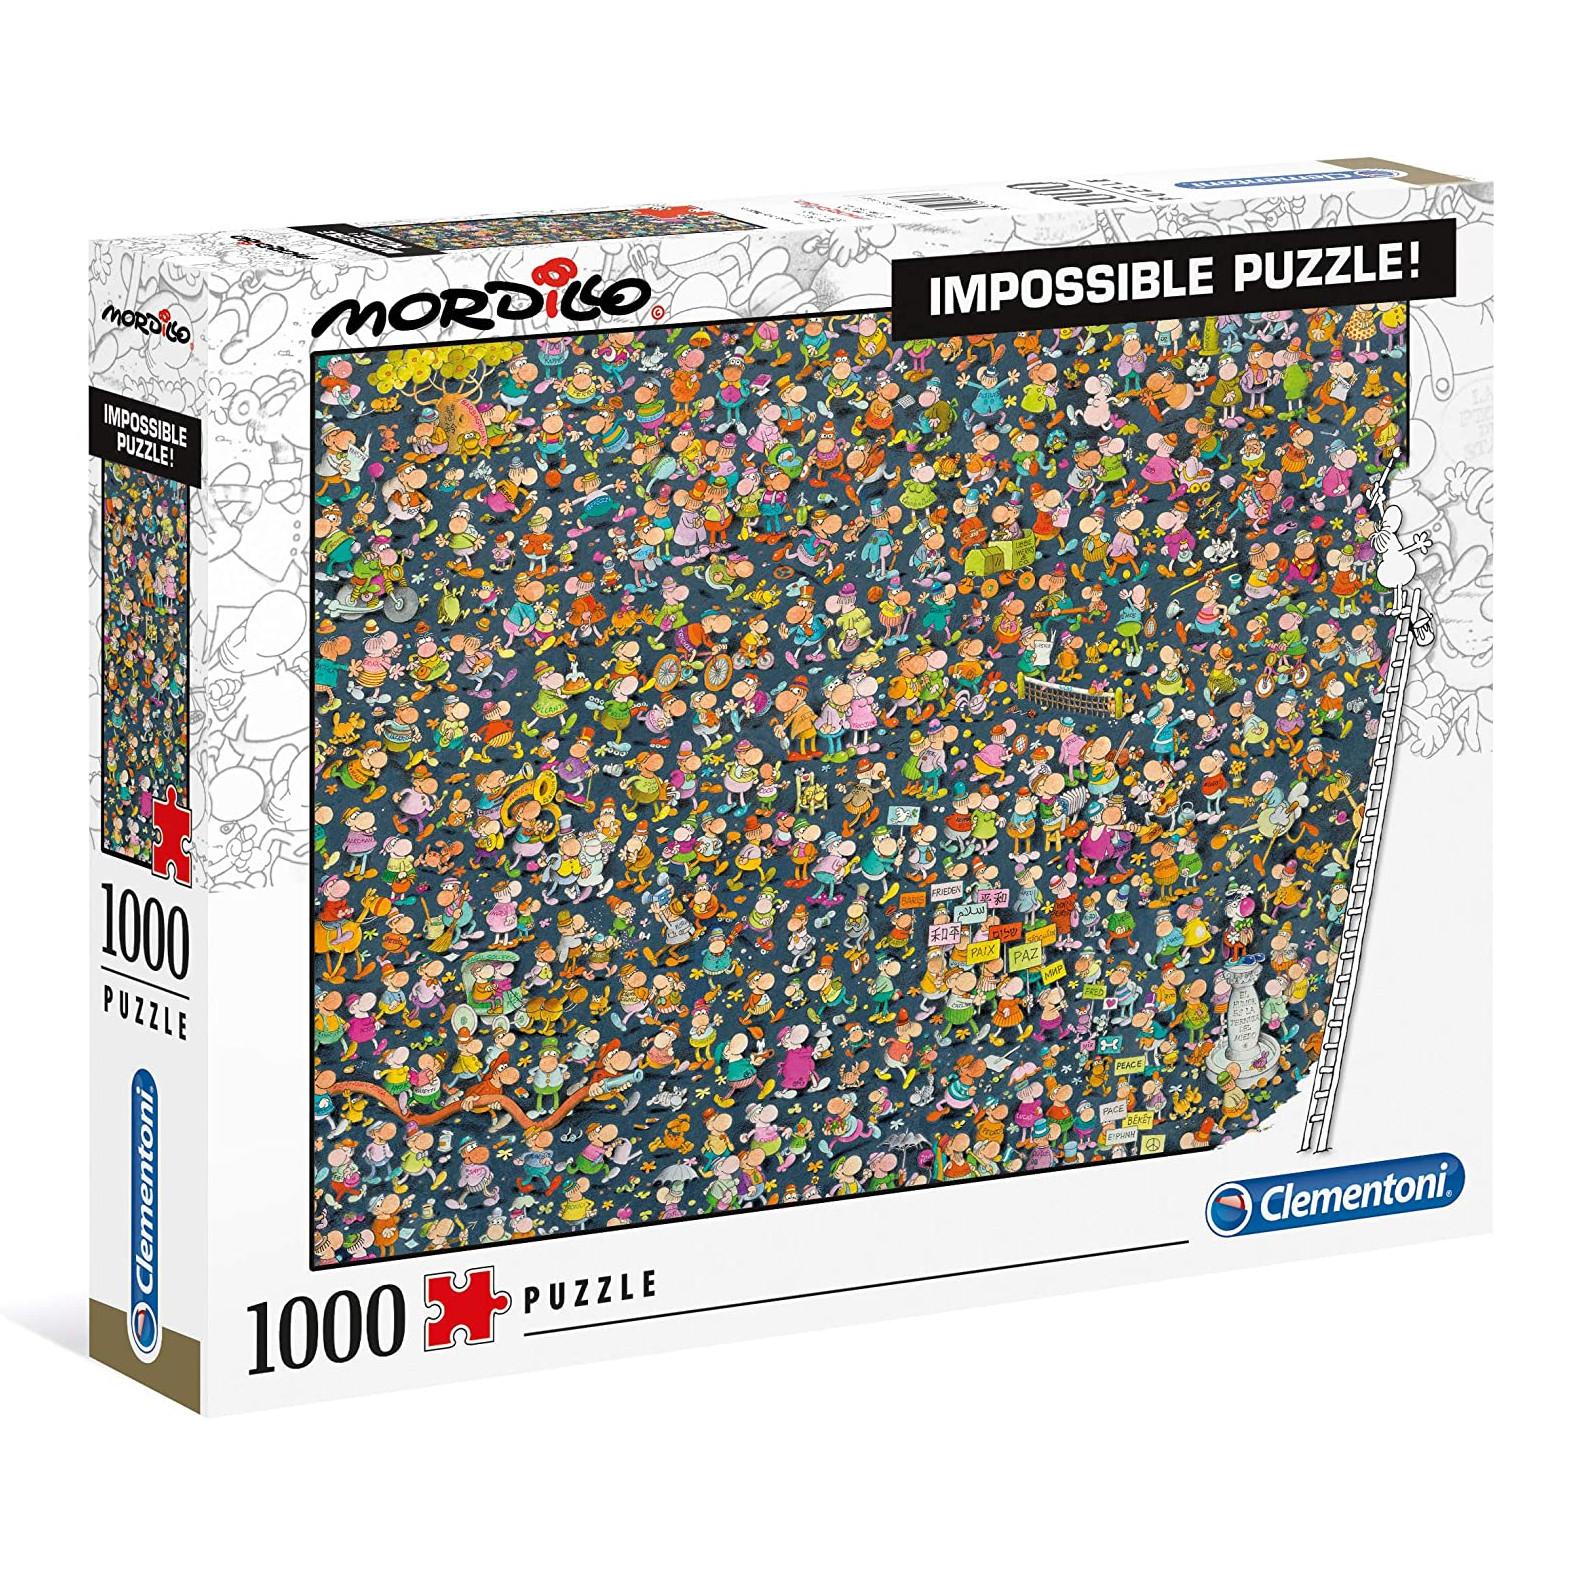 Clementoni 1000Pcs Jigsaw Puzzle  Mordillo Impossible